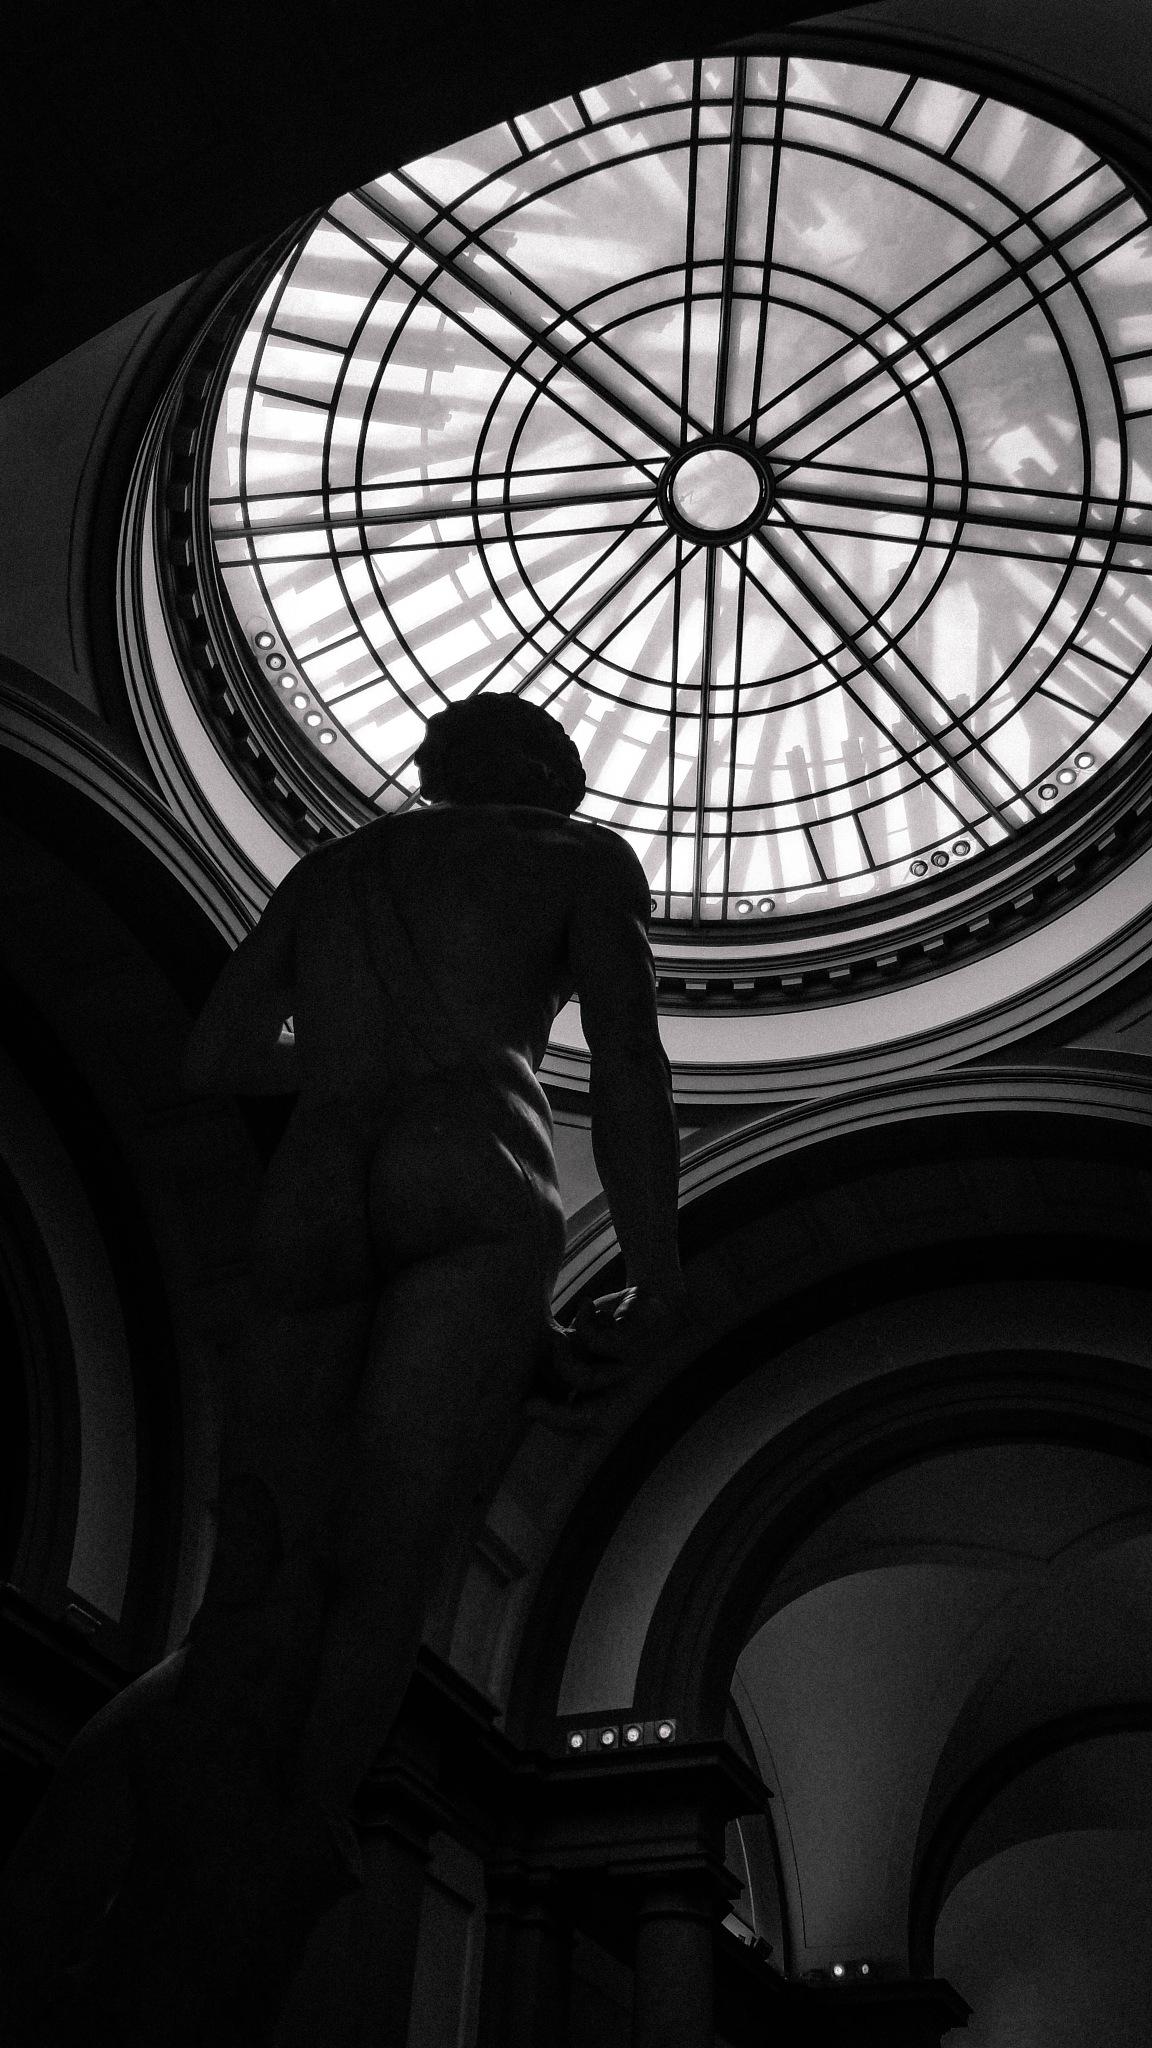 David by Michelangelo by Bulgan